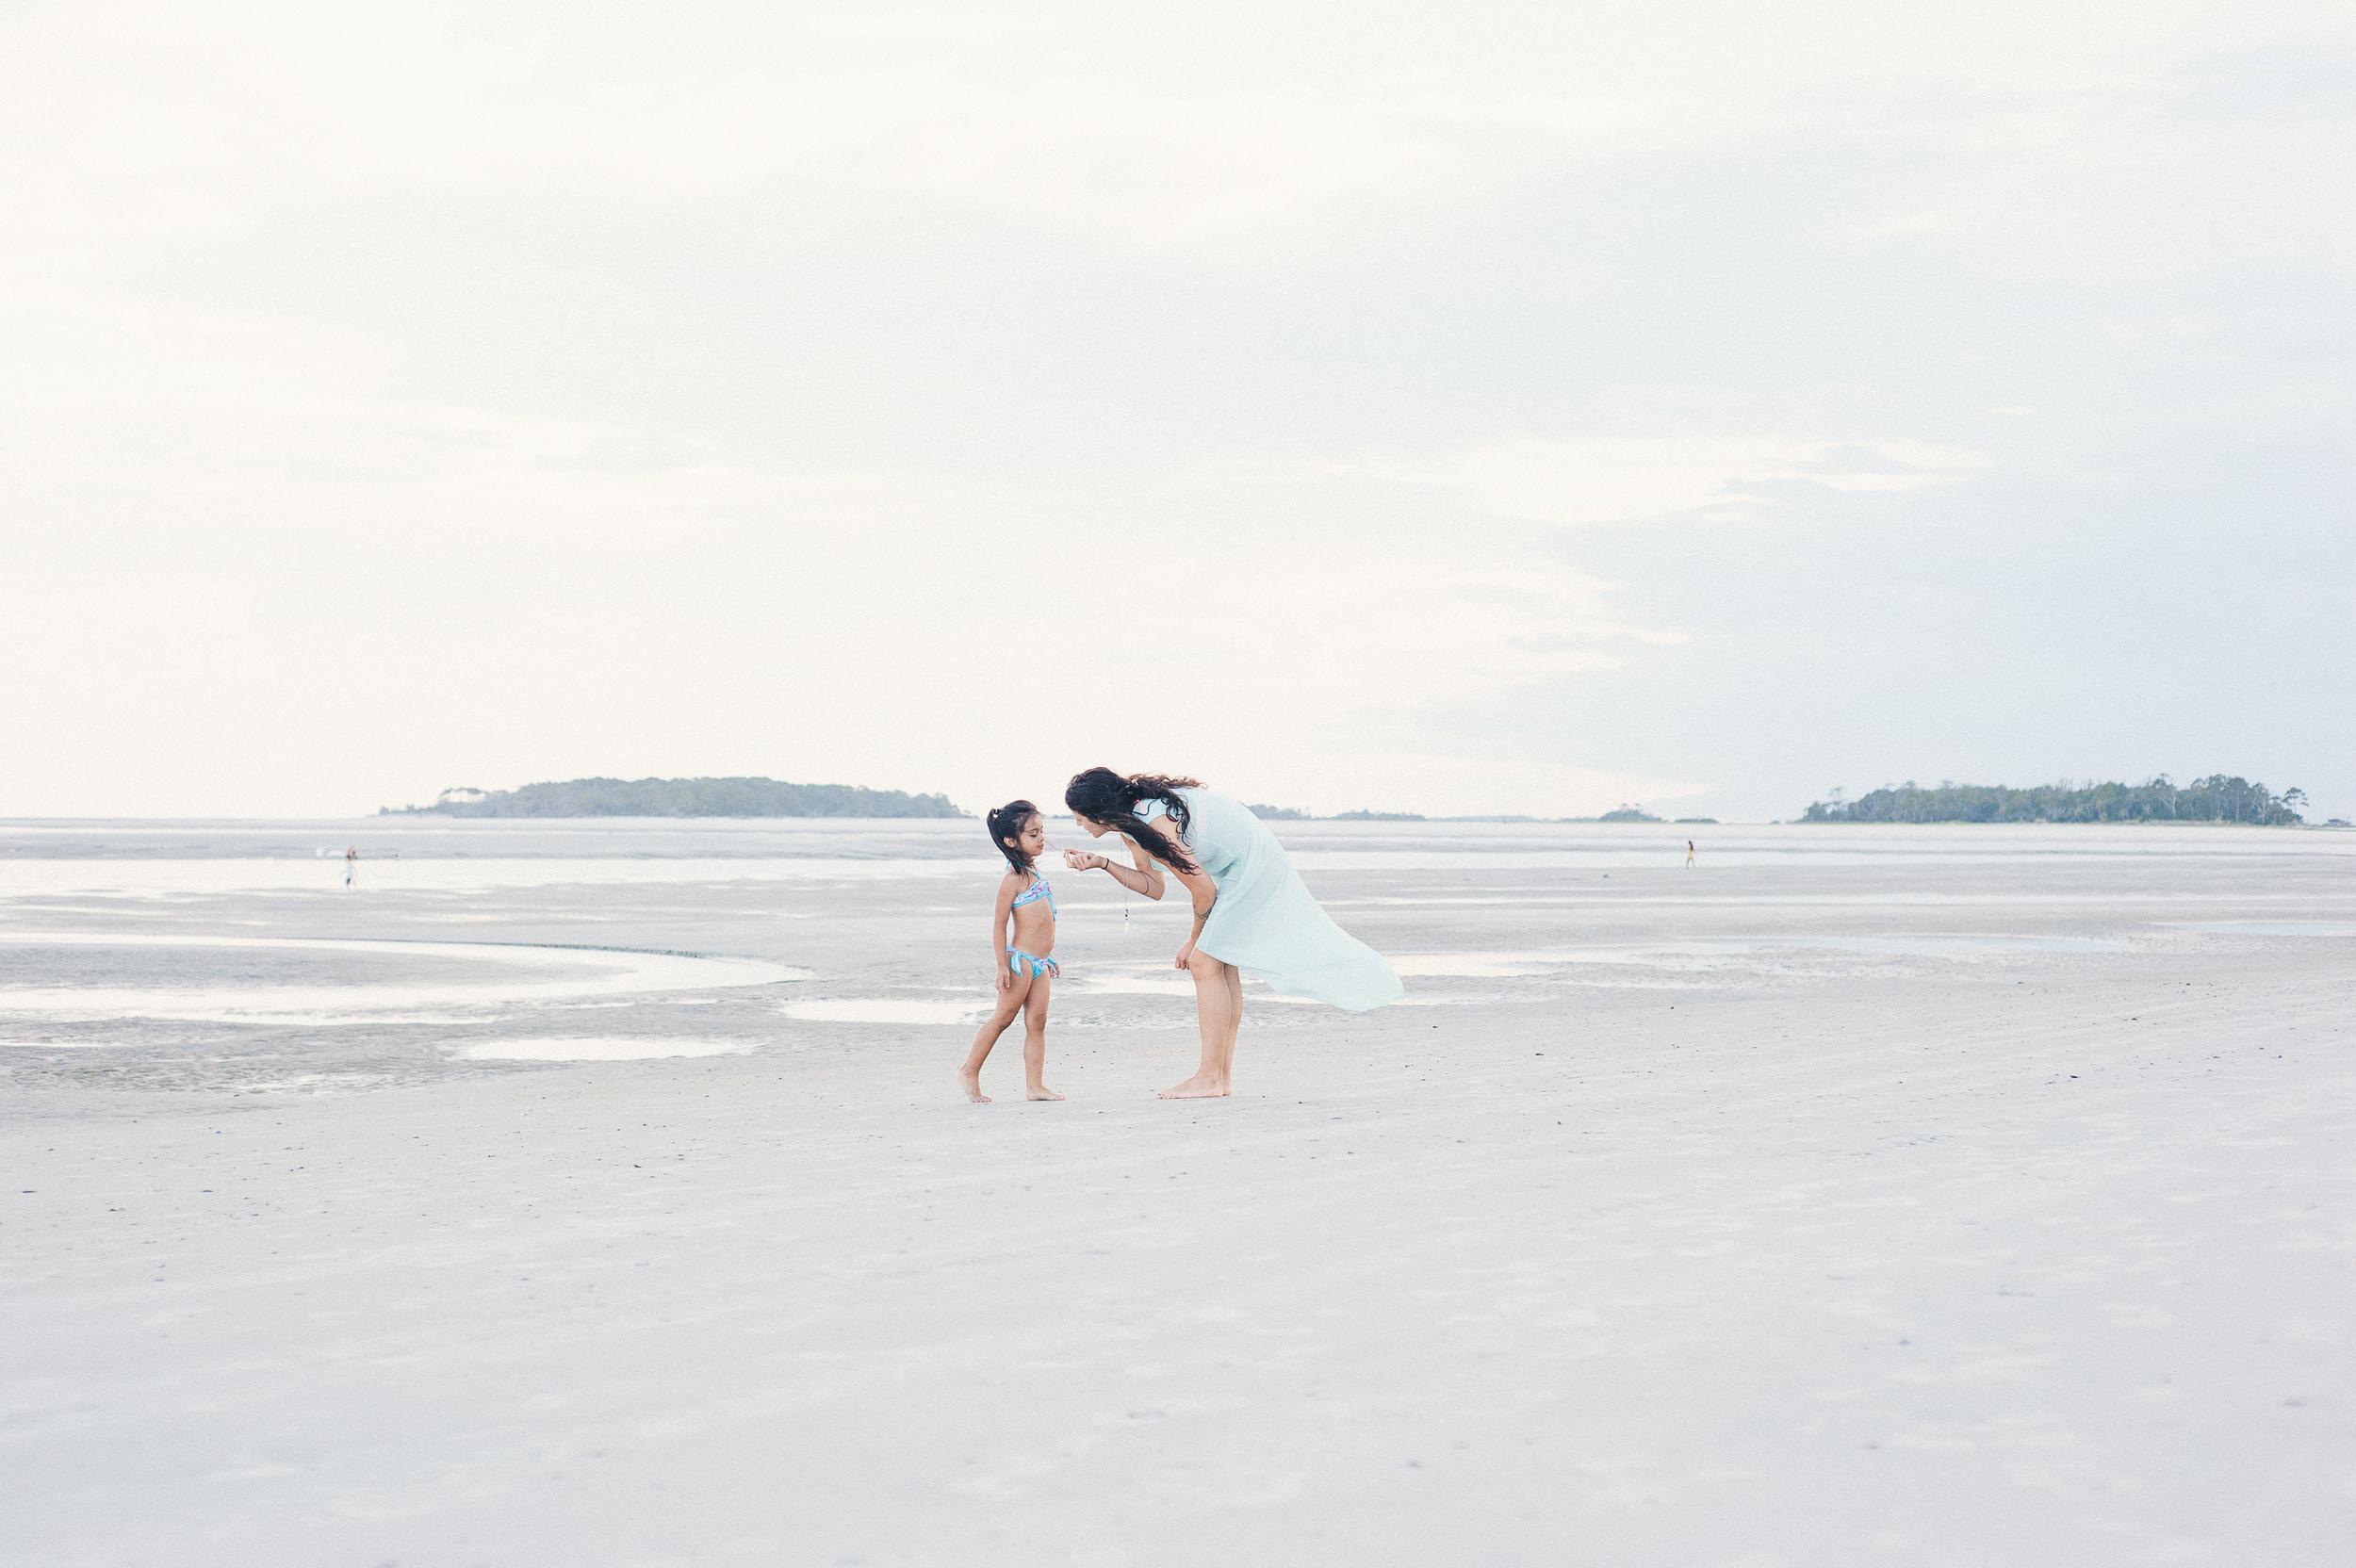 m.newsom-photography-savannah-wedding-photographer-tybee-island-photographer-kami-and-petra-july-2015 (20 of 230).jpg